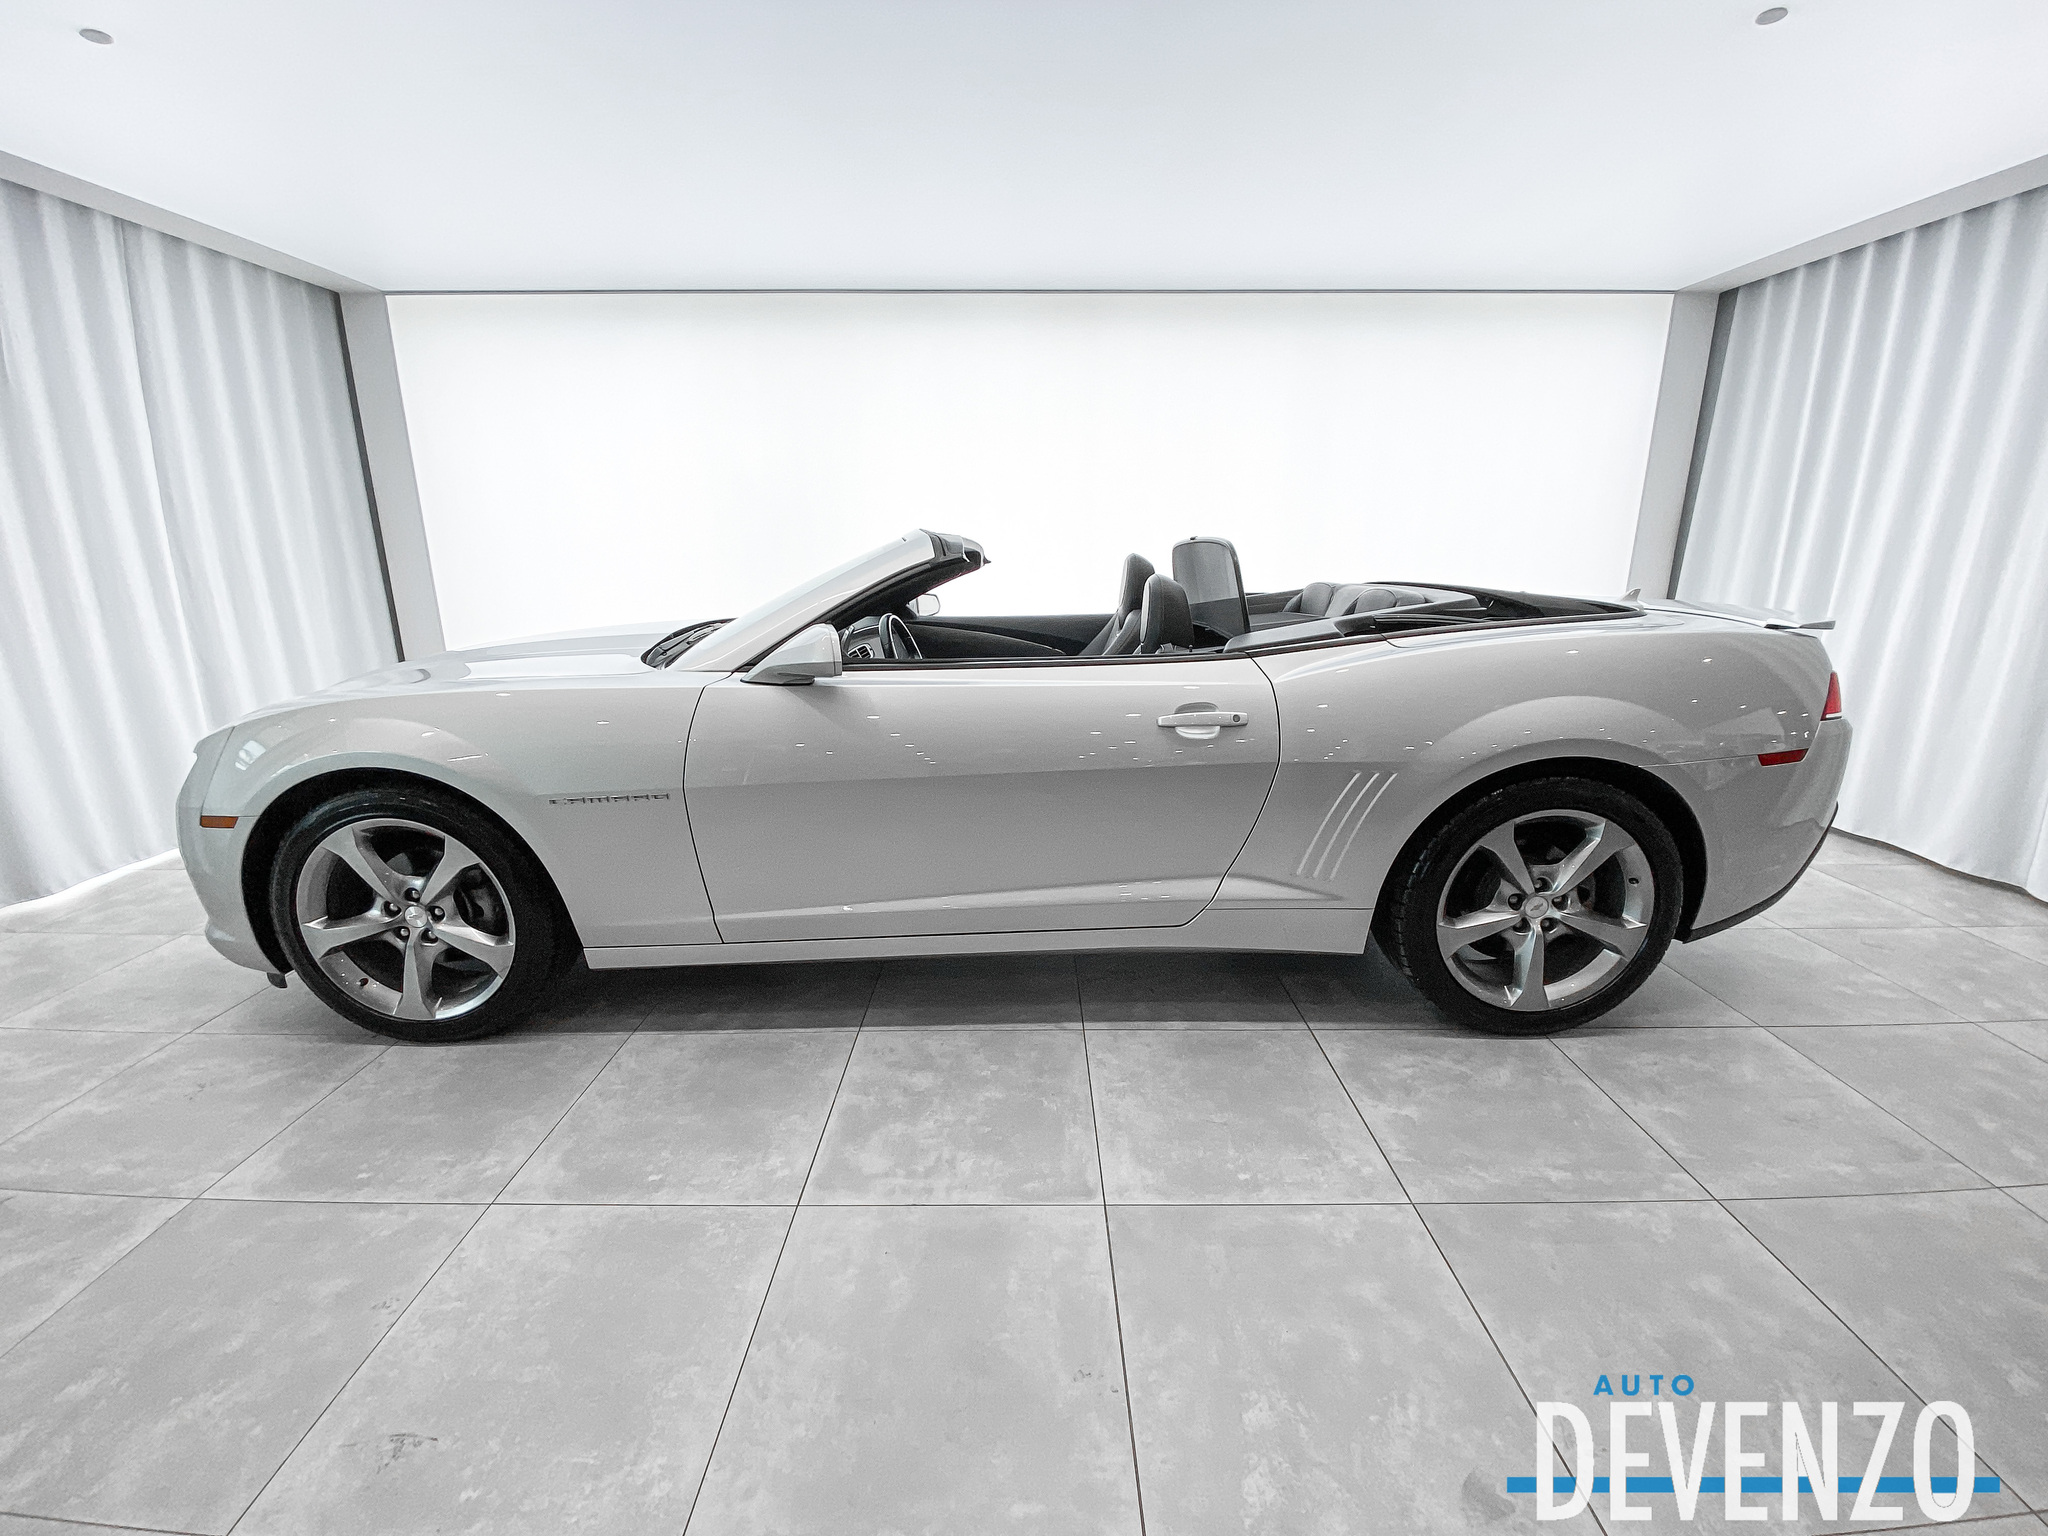 2014 Chevrolet Camaro Convertible 2LT RS Edition Camera / Jantes 20» complet